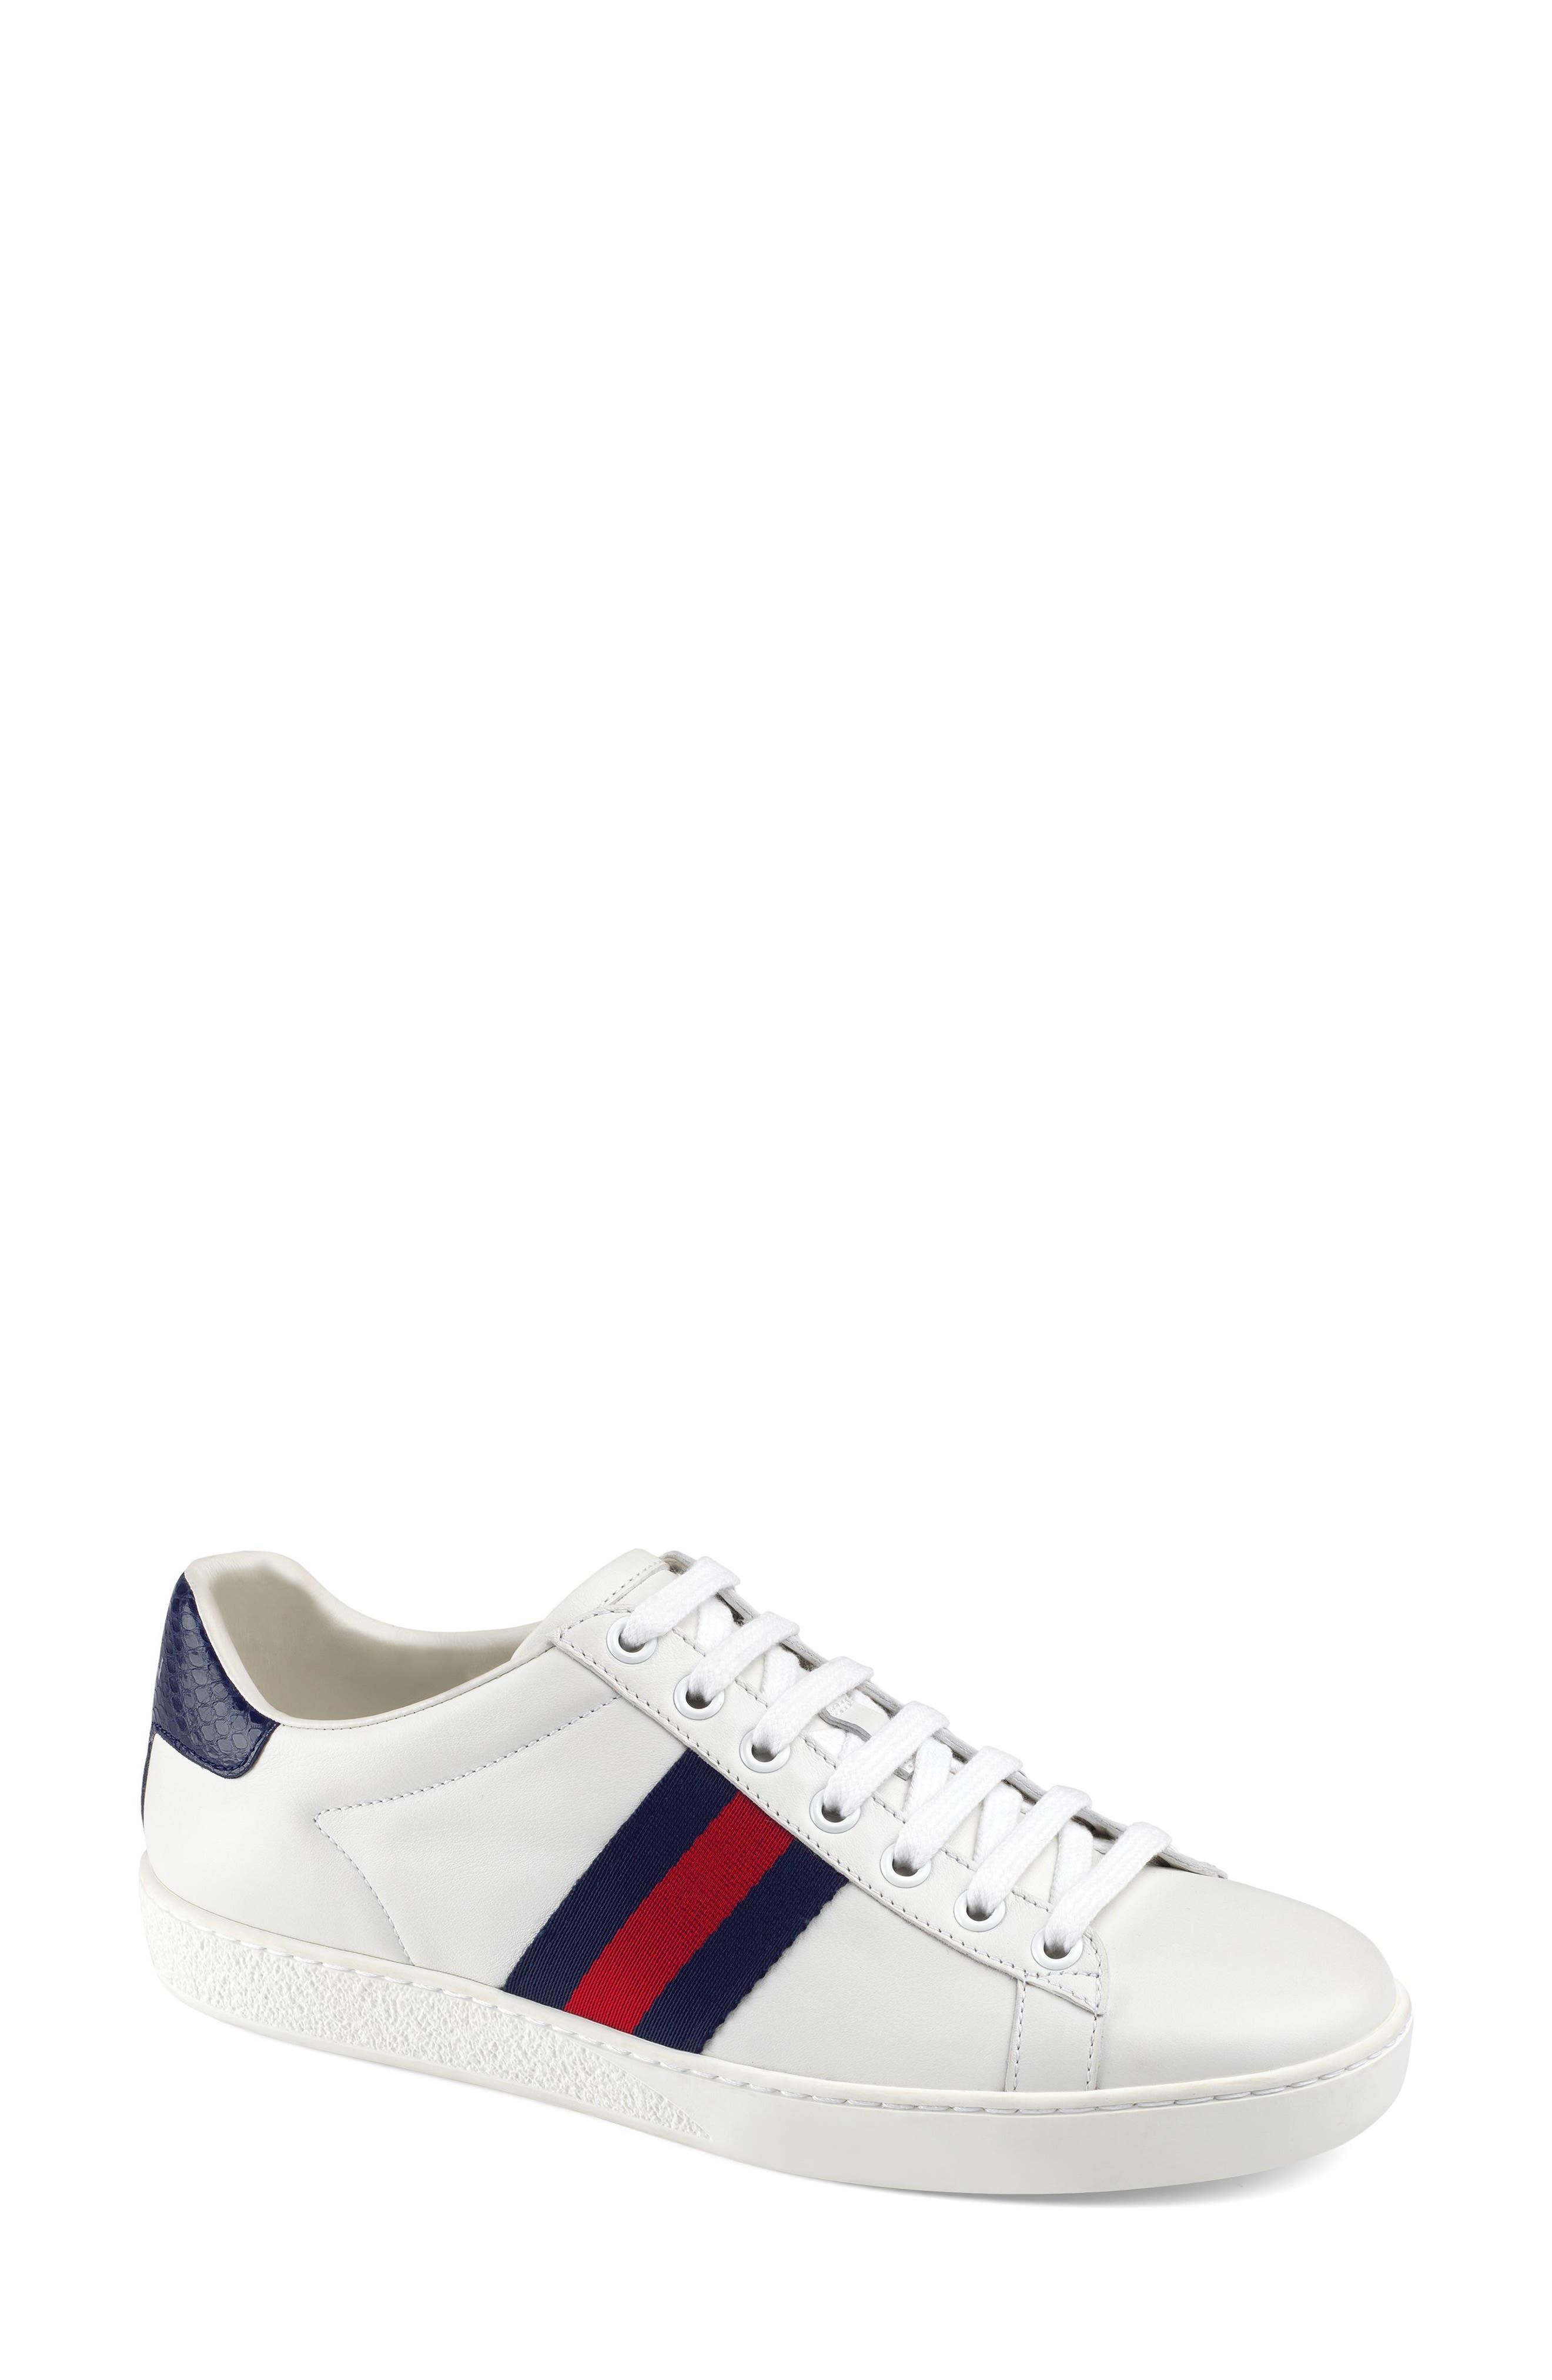 GUCCI 'New Ace' Sneaker, Main, color, WHITE/ BLUE